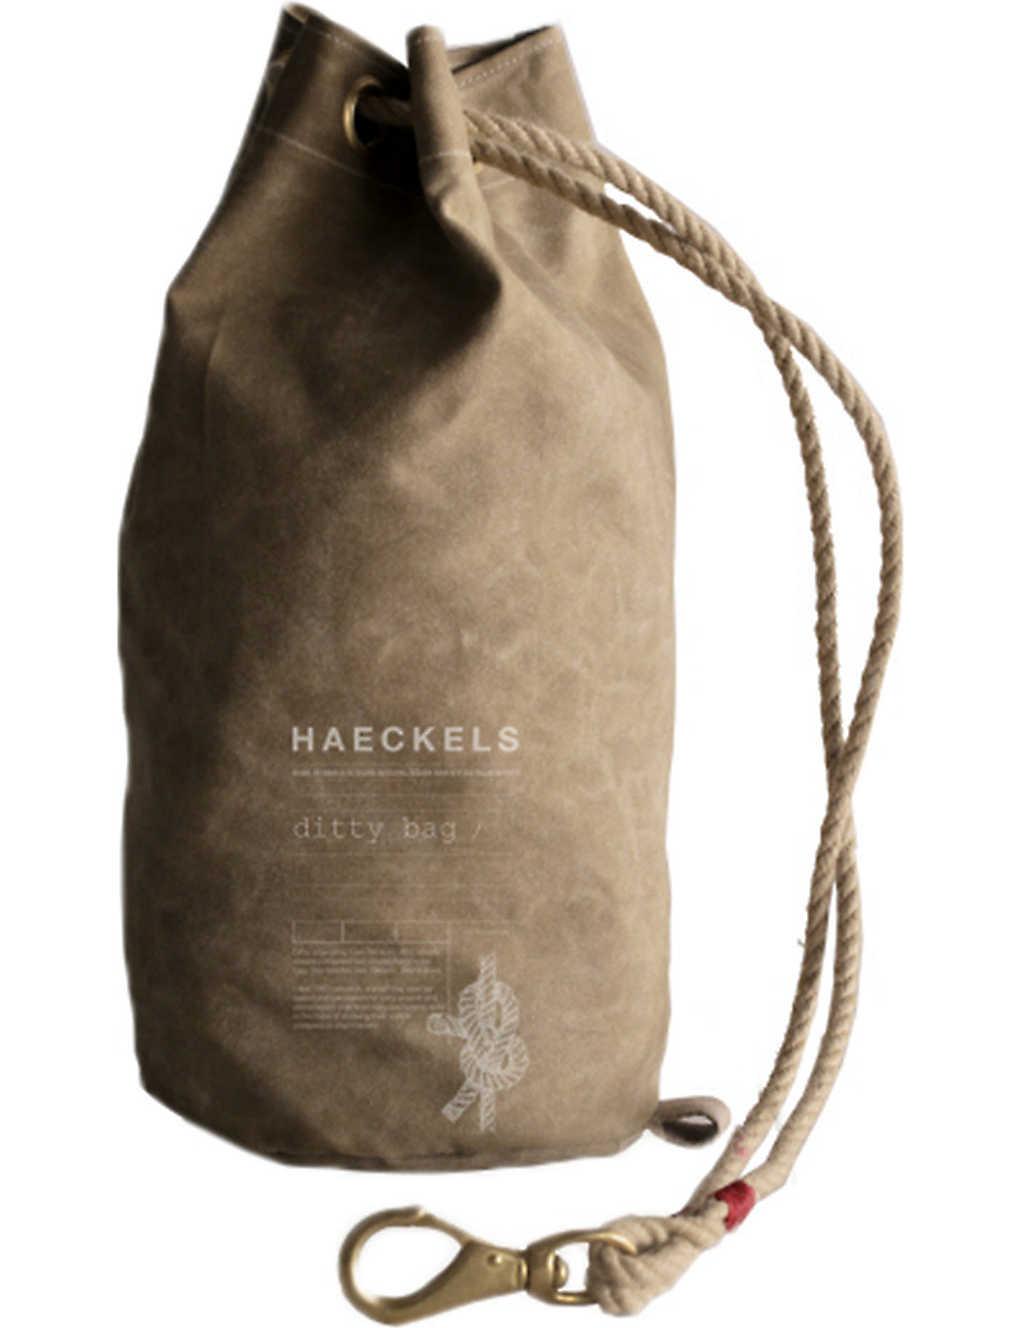 957b3d493d HAECKELS - Sailors waxed canvas ditty bag